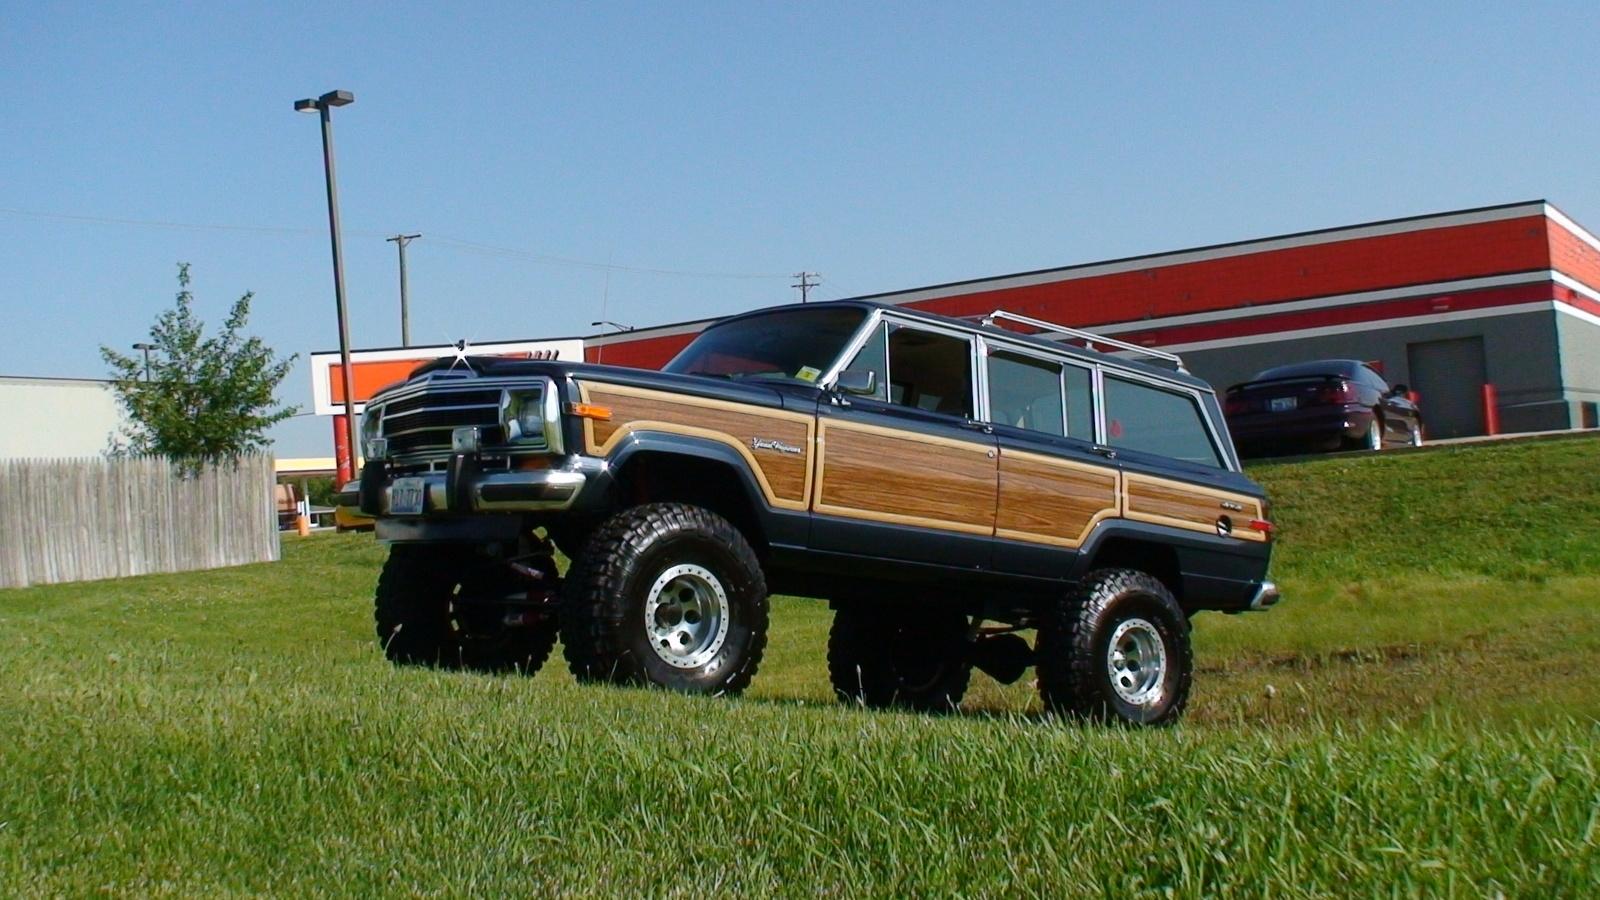 1990 Jeep Grand Wagoneer #5 Jeep Grand Wagoneer #5